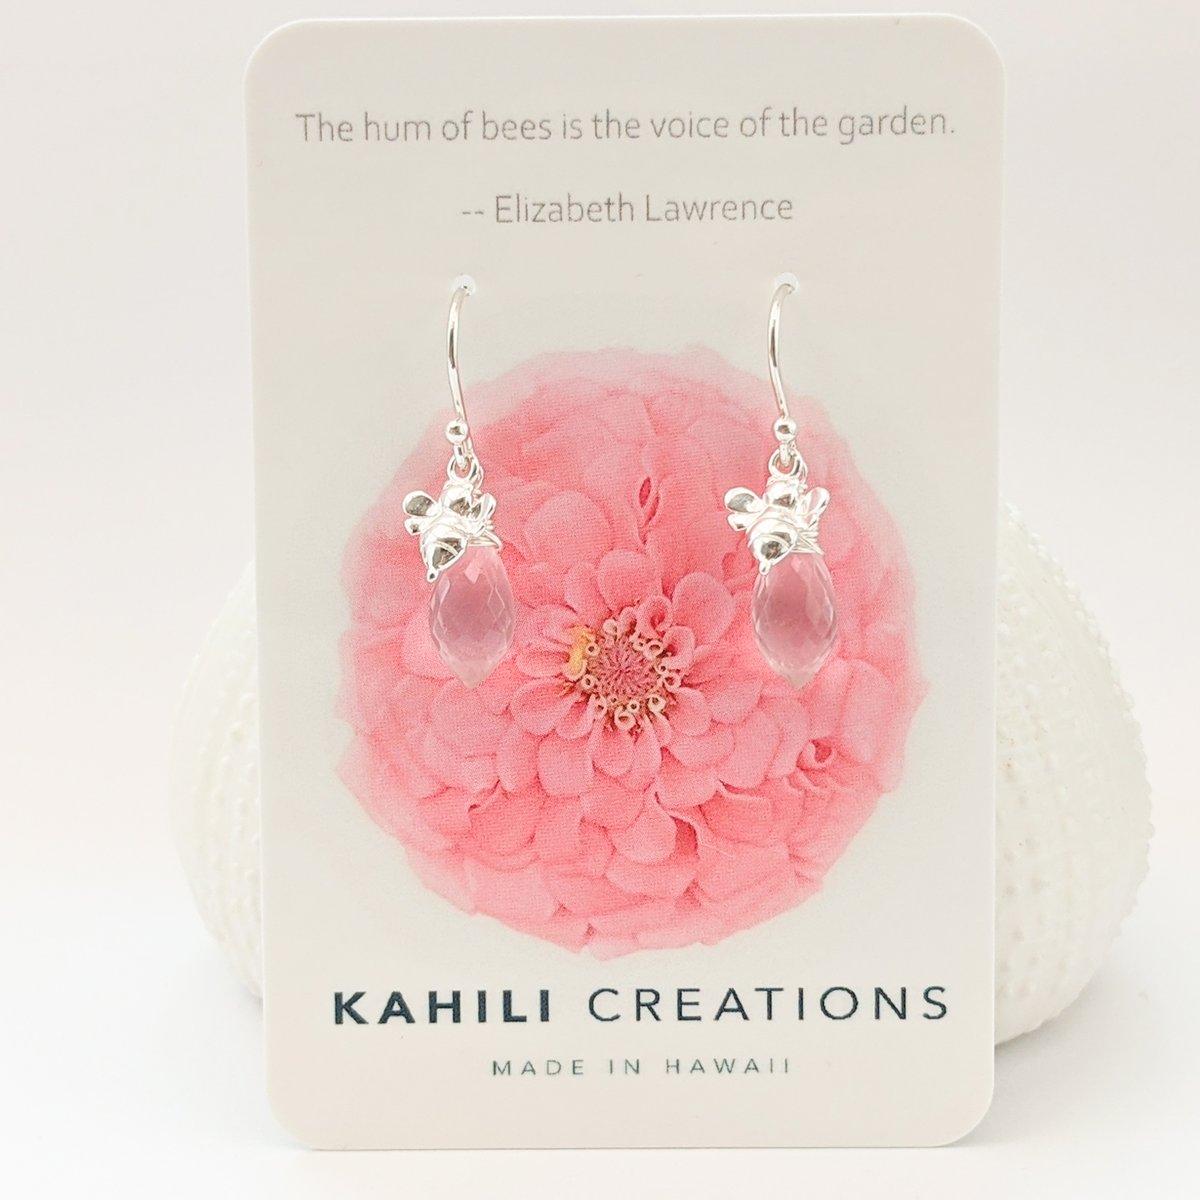 Image of Rose Quartz Bee Earrings